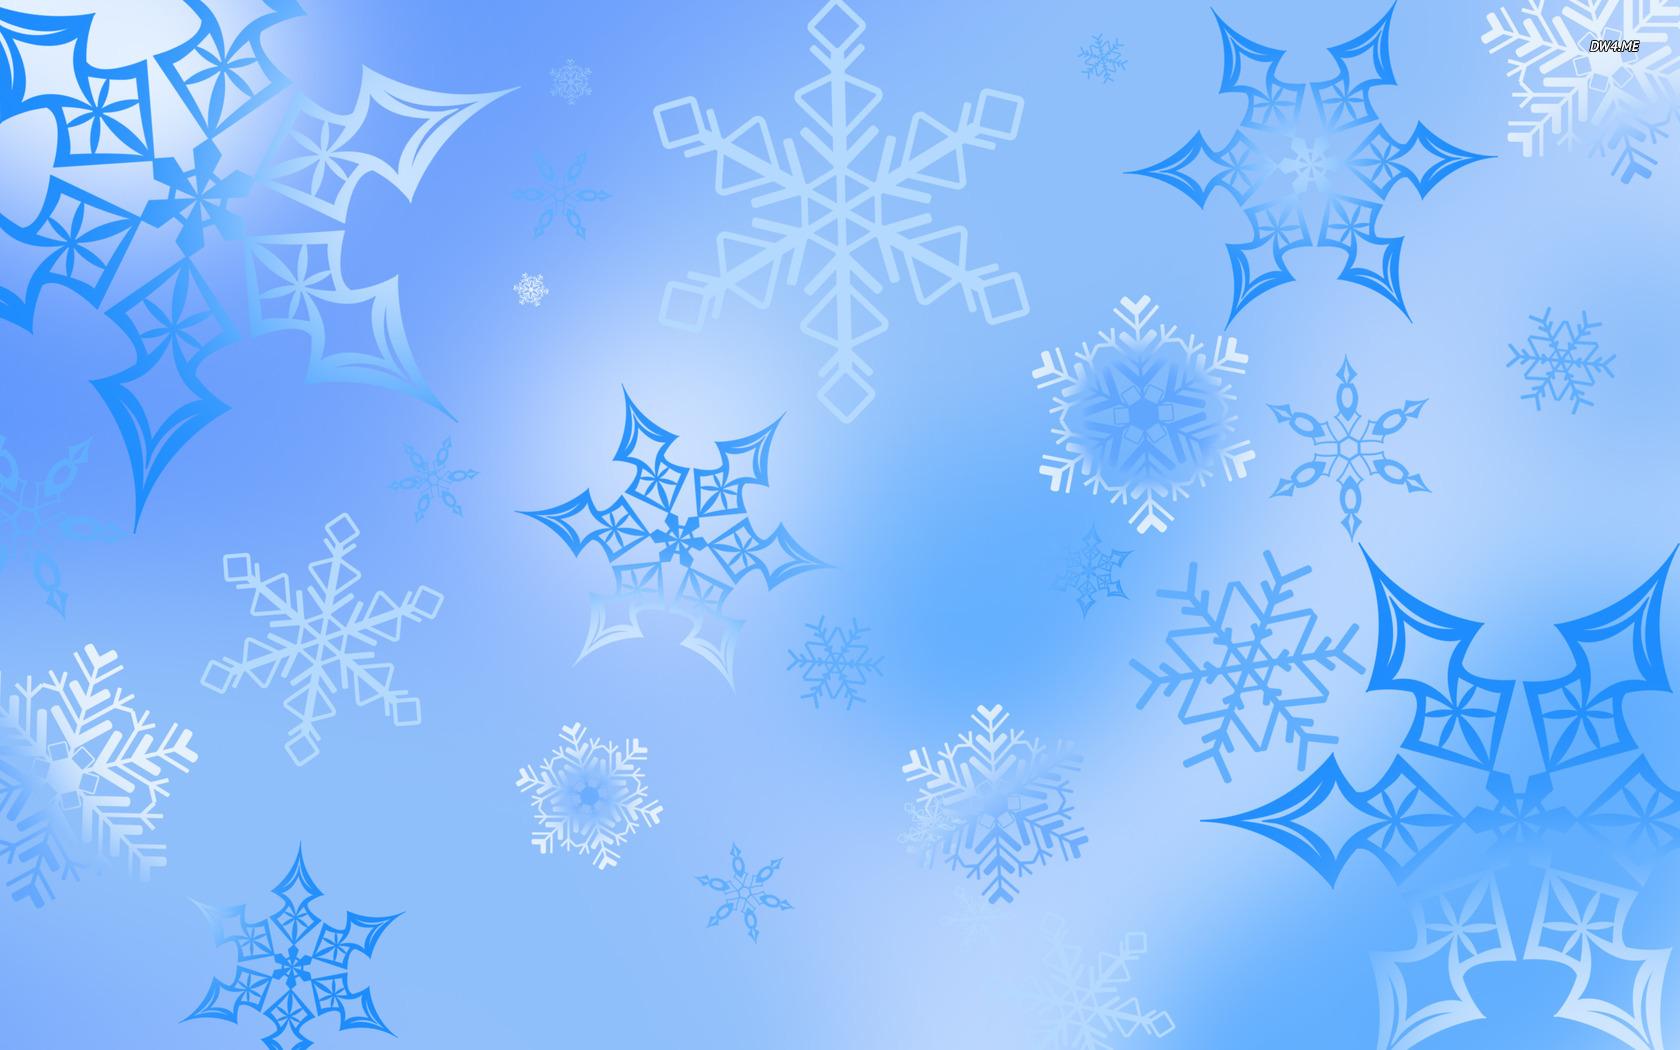 Free snowflake desktop wallpaper wallpapersafari snowflakes wallpaper 2560x1600 snowflakes wallpaper 2880x1800 1680x1050 voltagebd Gallery